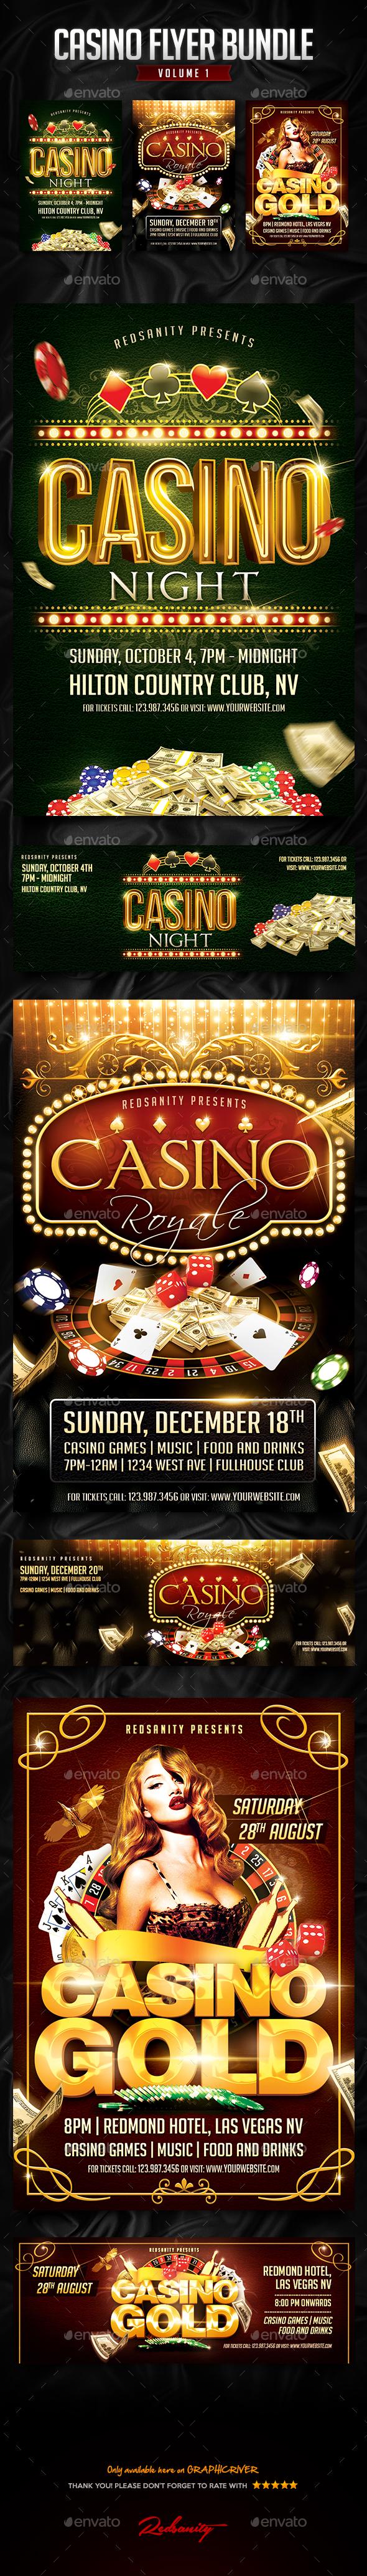 Casino Flyer Bundle Vol.1 - Events Flyers